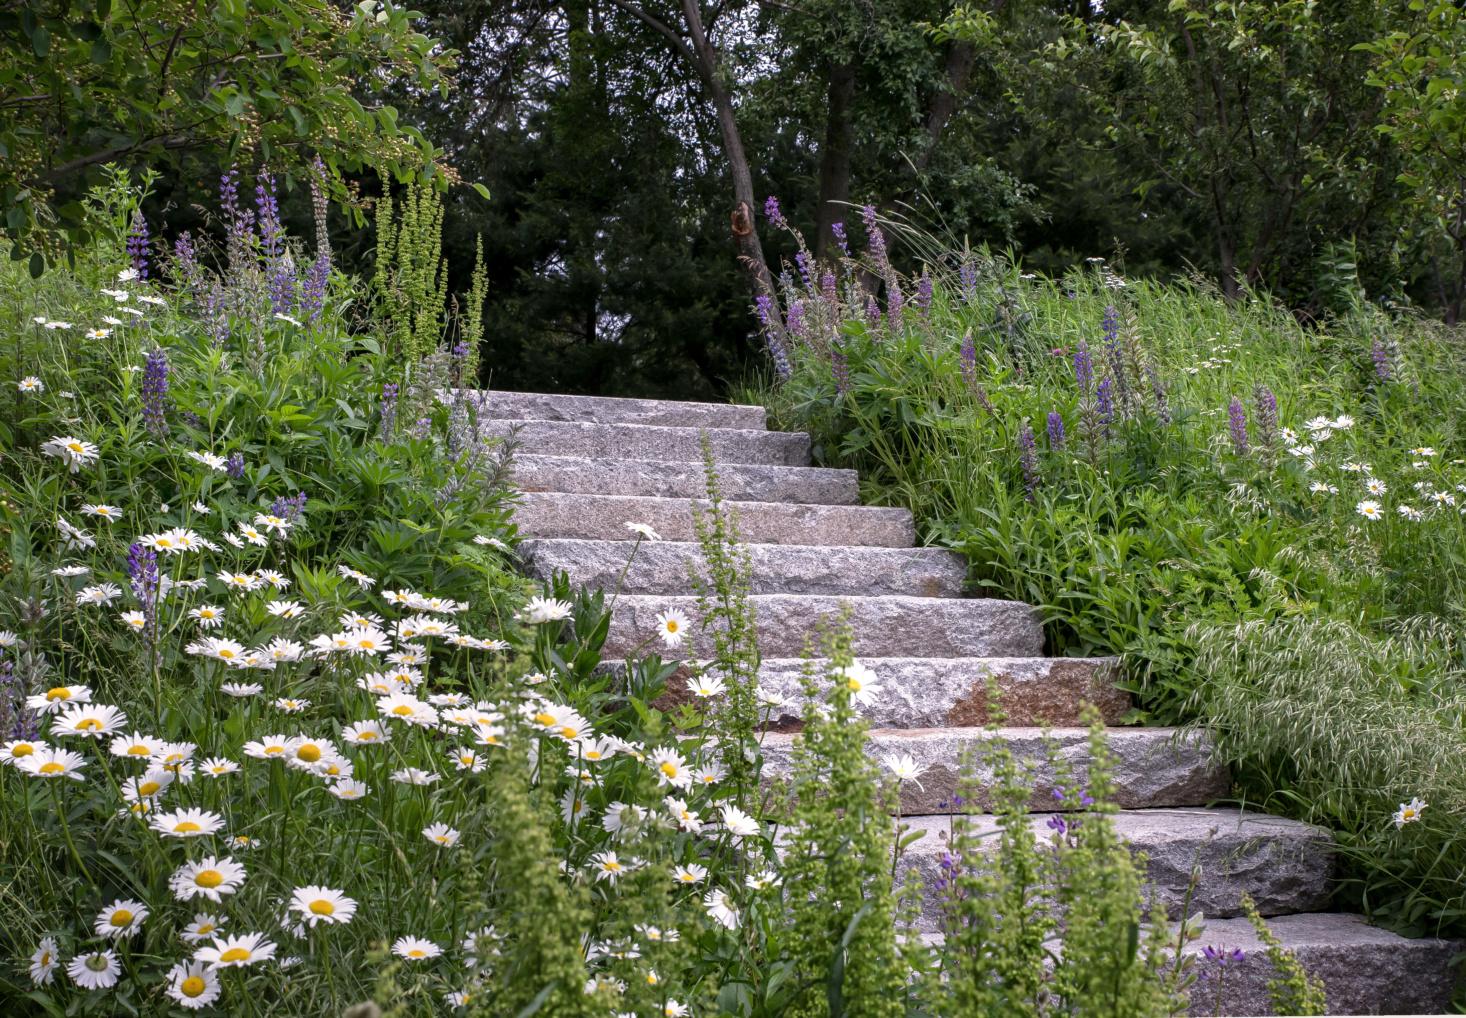 brookline-farm-bob-hanss-stairs-3-1466x1018.jpg